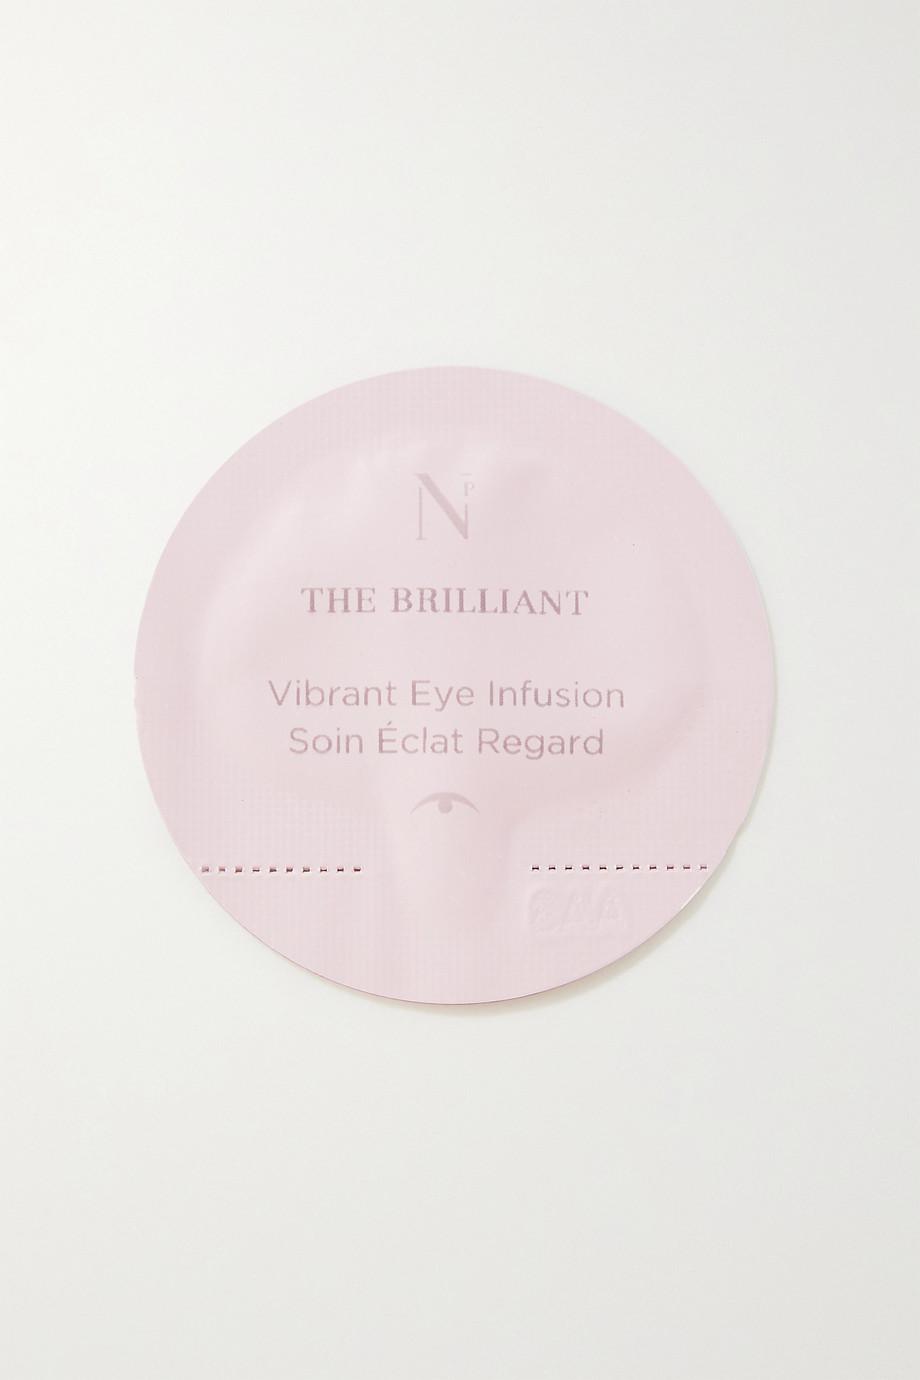 Noble Panacea The Brilliant Vibrant Eye Infusion Refill, 30 x 0.3ml